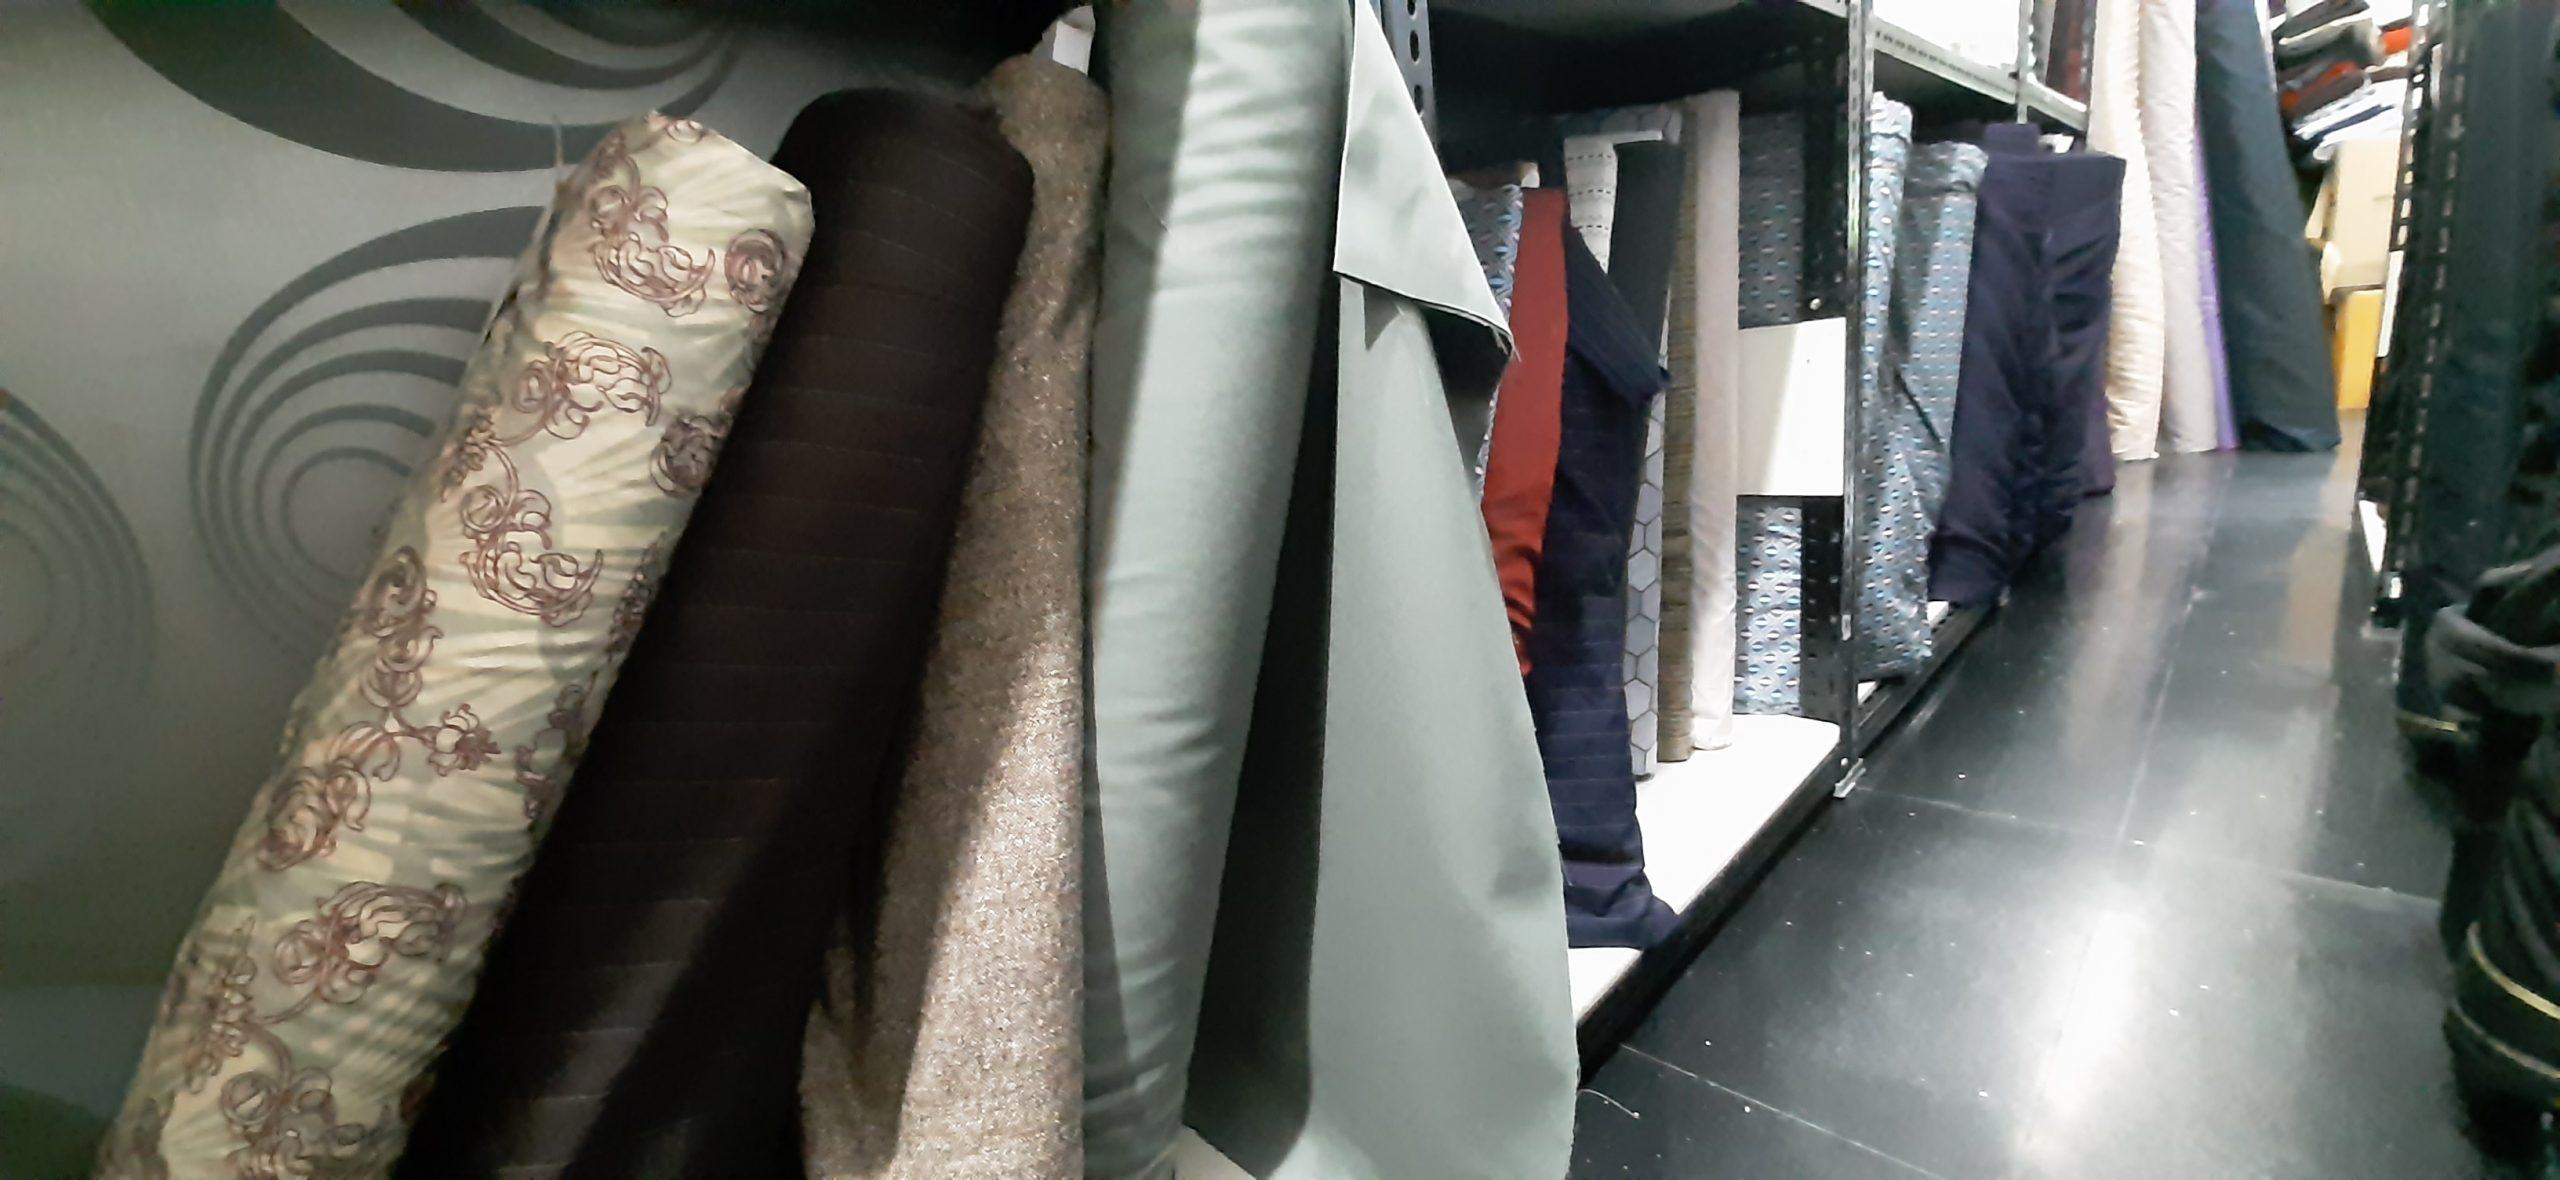 Magnoli Clothiers rolls of fabric